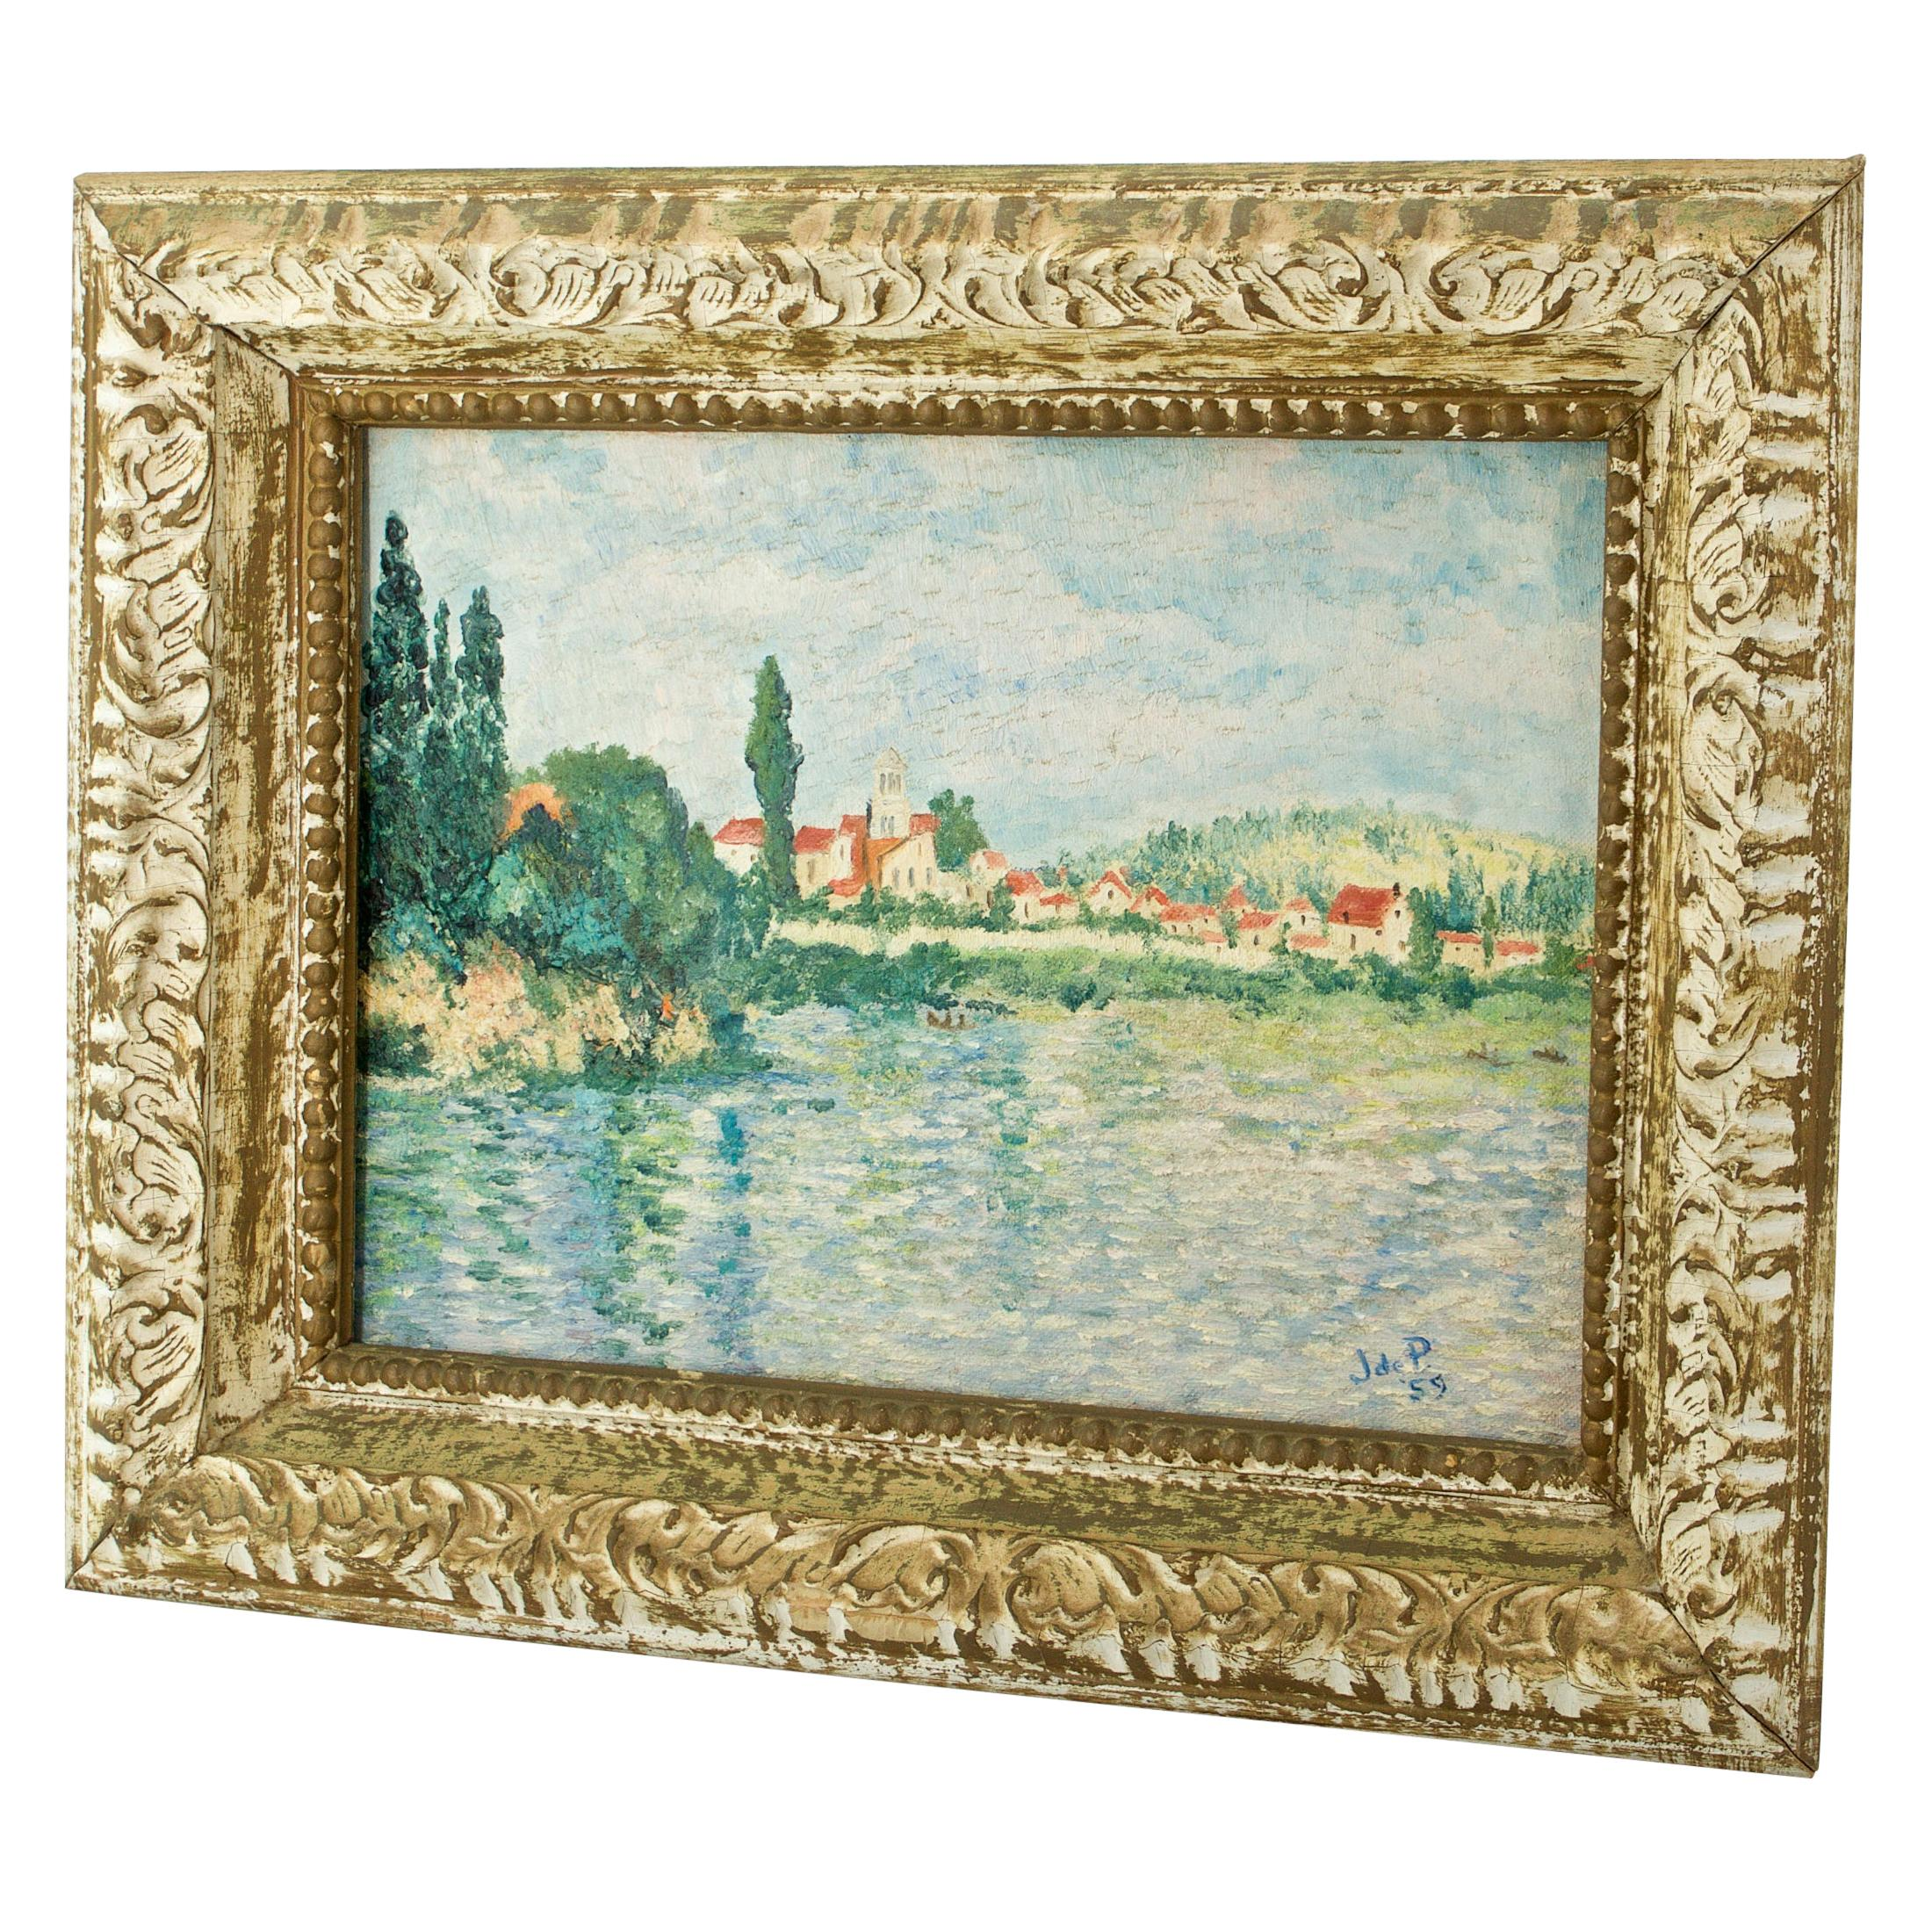 1950s French Midcentury Street Art Painting Claude Monet Vetheuil Seine River